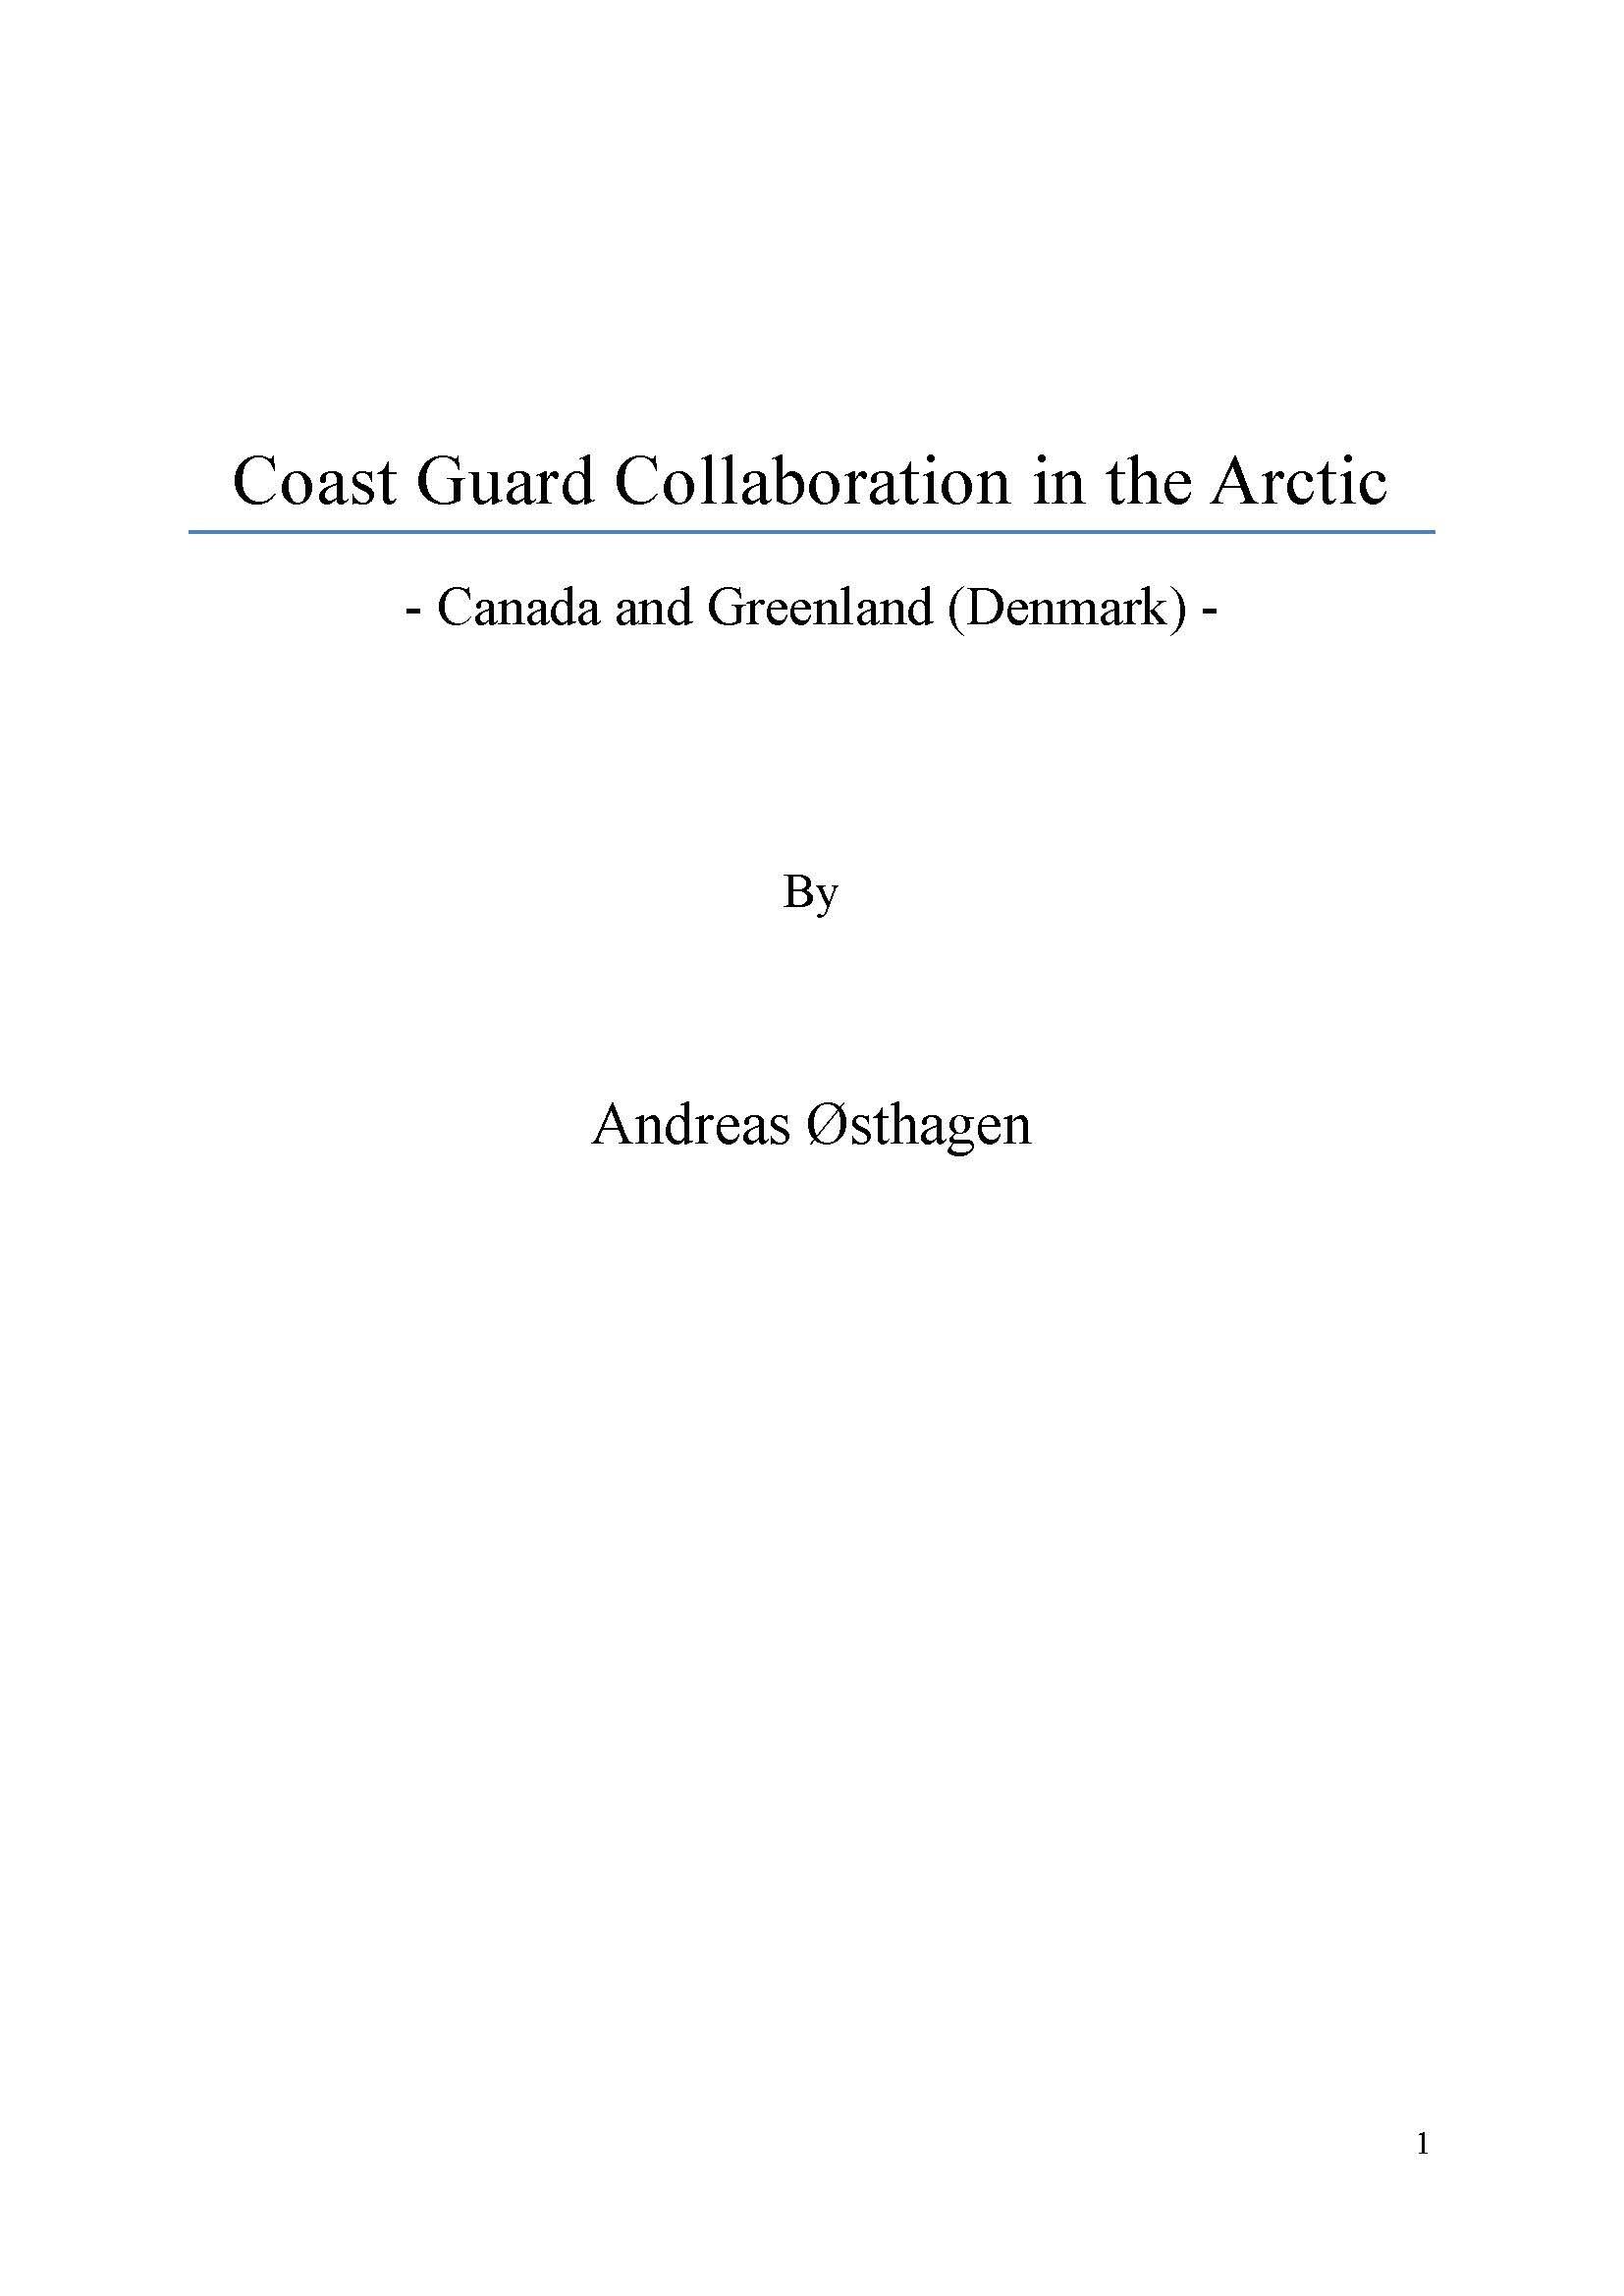 2014_Andreas_CoastGuardCollaboration_COVERONLY